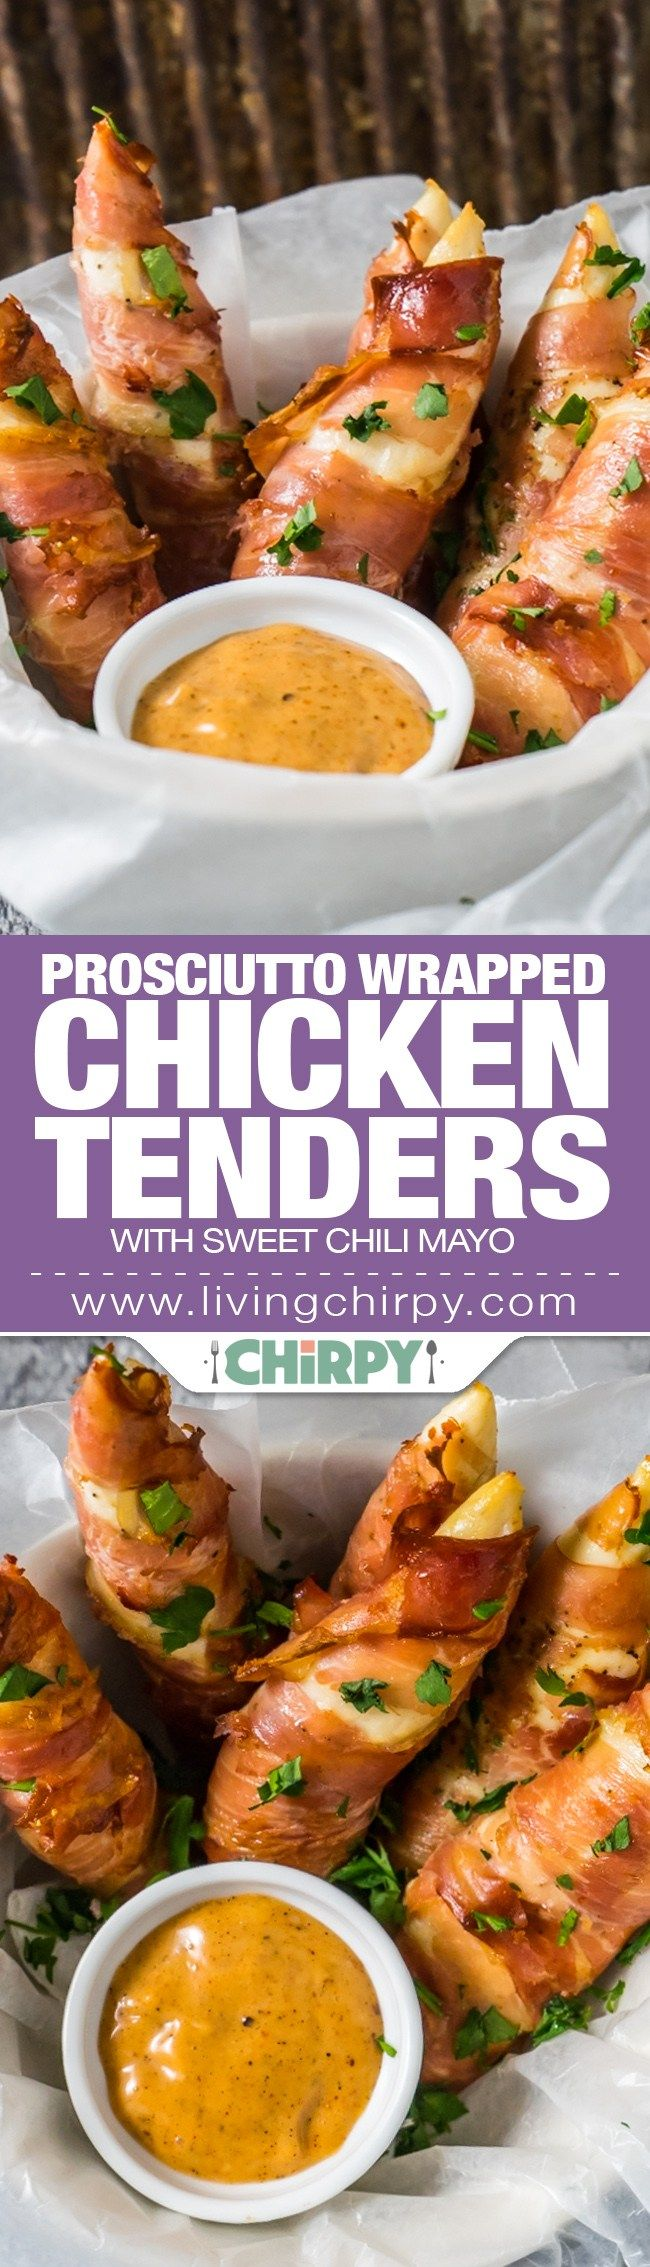 Prosciutto Wrapped Chicken Tenders